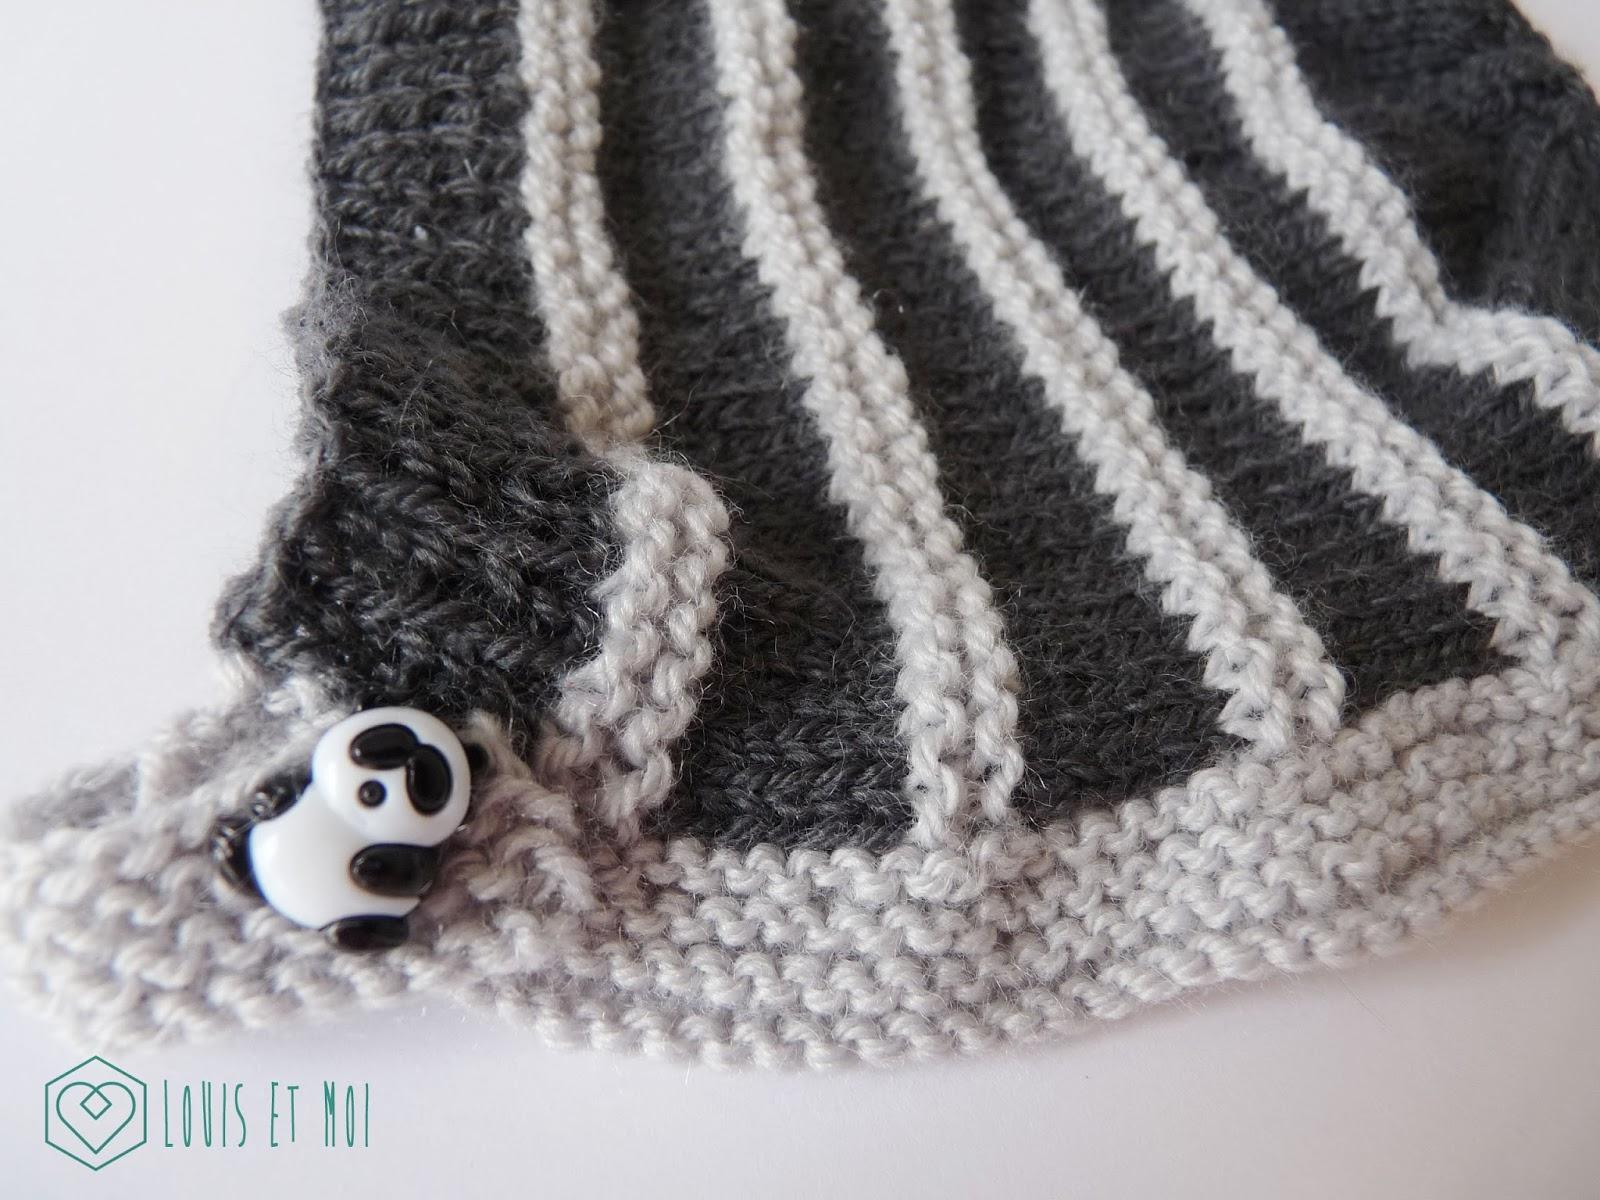 Louis et Moi (cosen y hacen crochet): marzo 2014